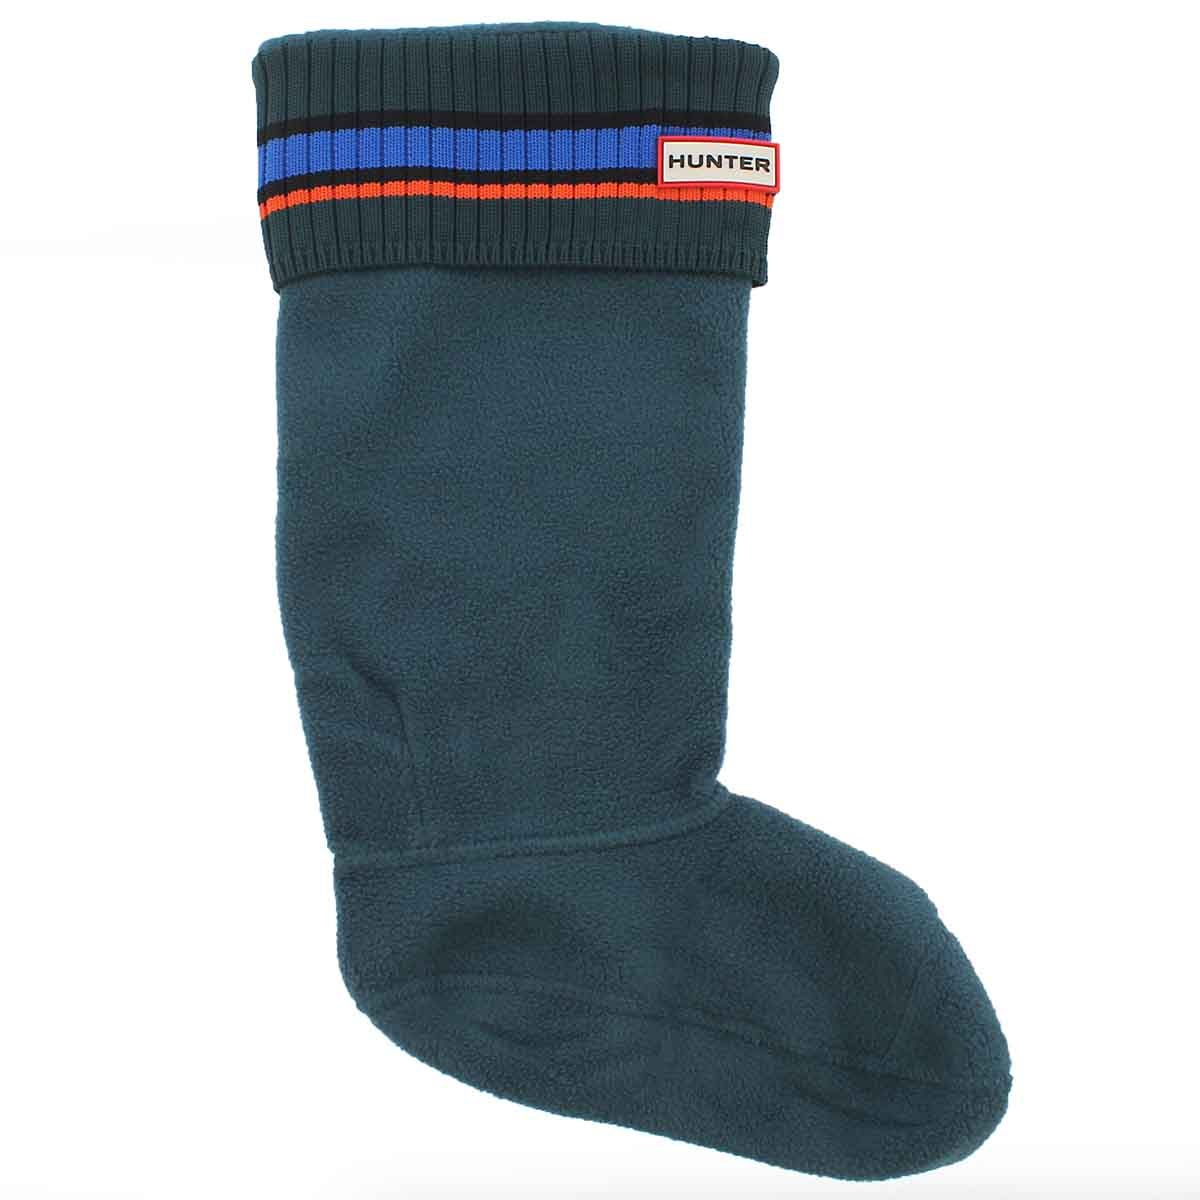 Chausson Buoy Stripe, vert/bleu/rge, fem